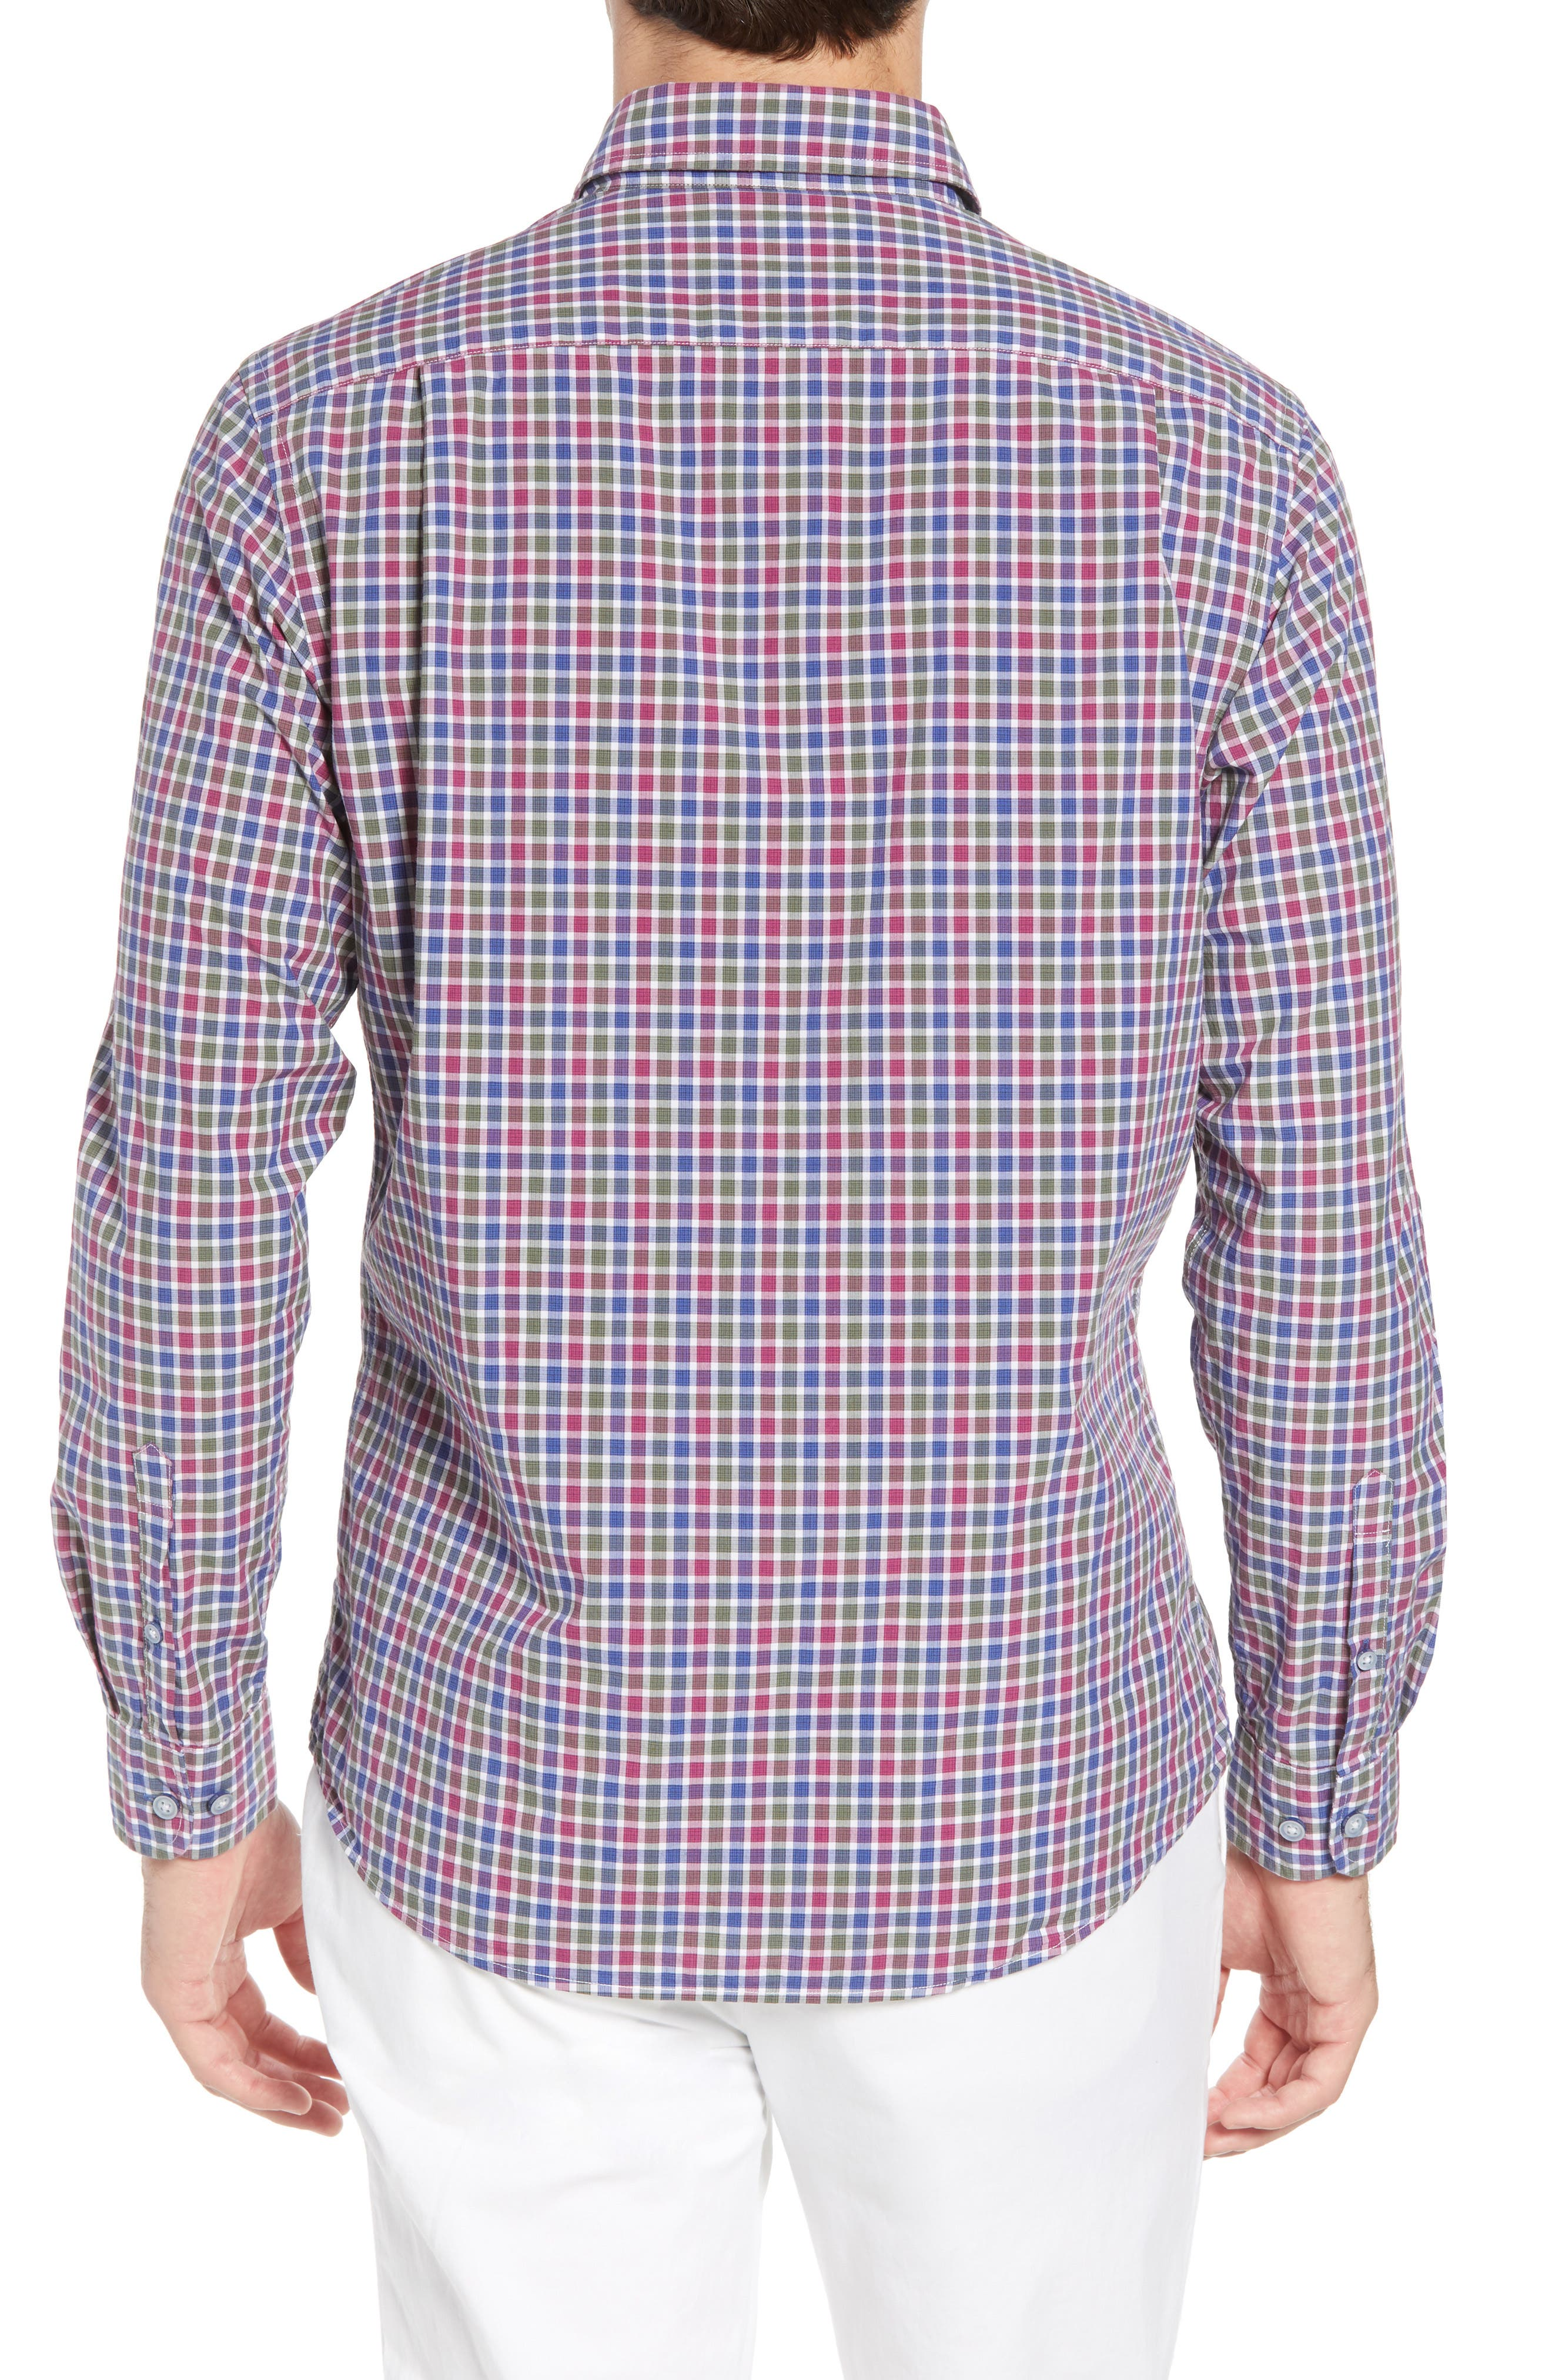 Alternate Image 3  - Rodd & Gunn Macreas Flat Regular Fit Sport Shirt